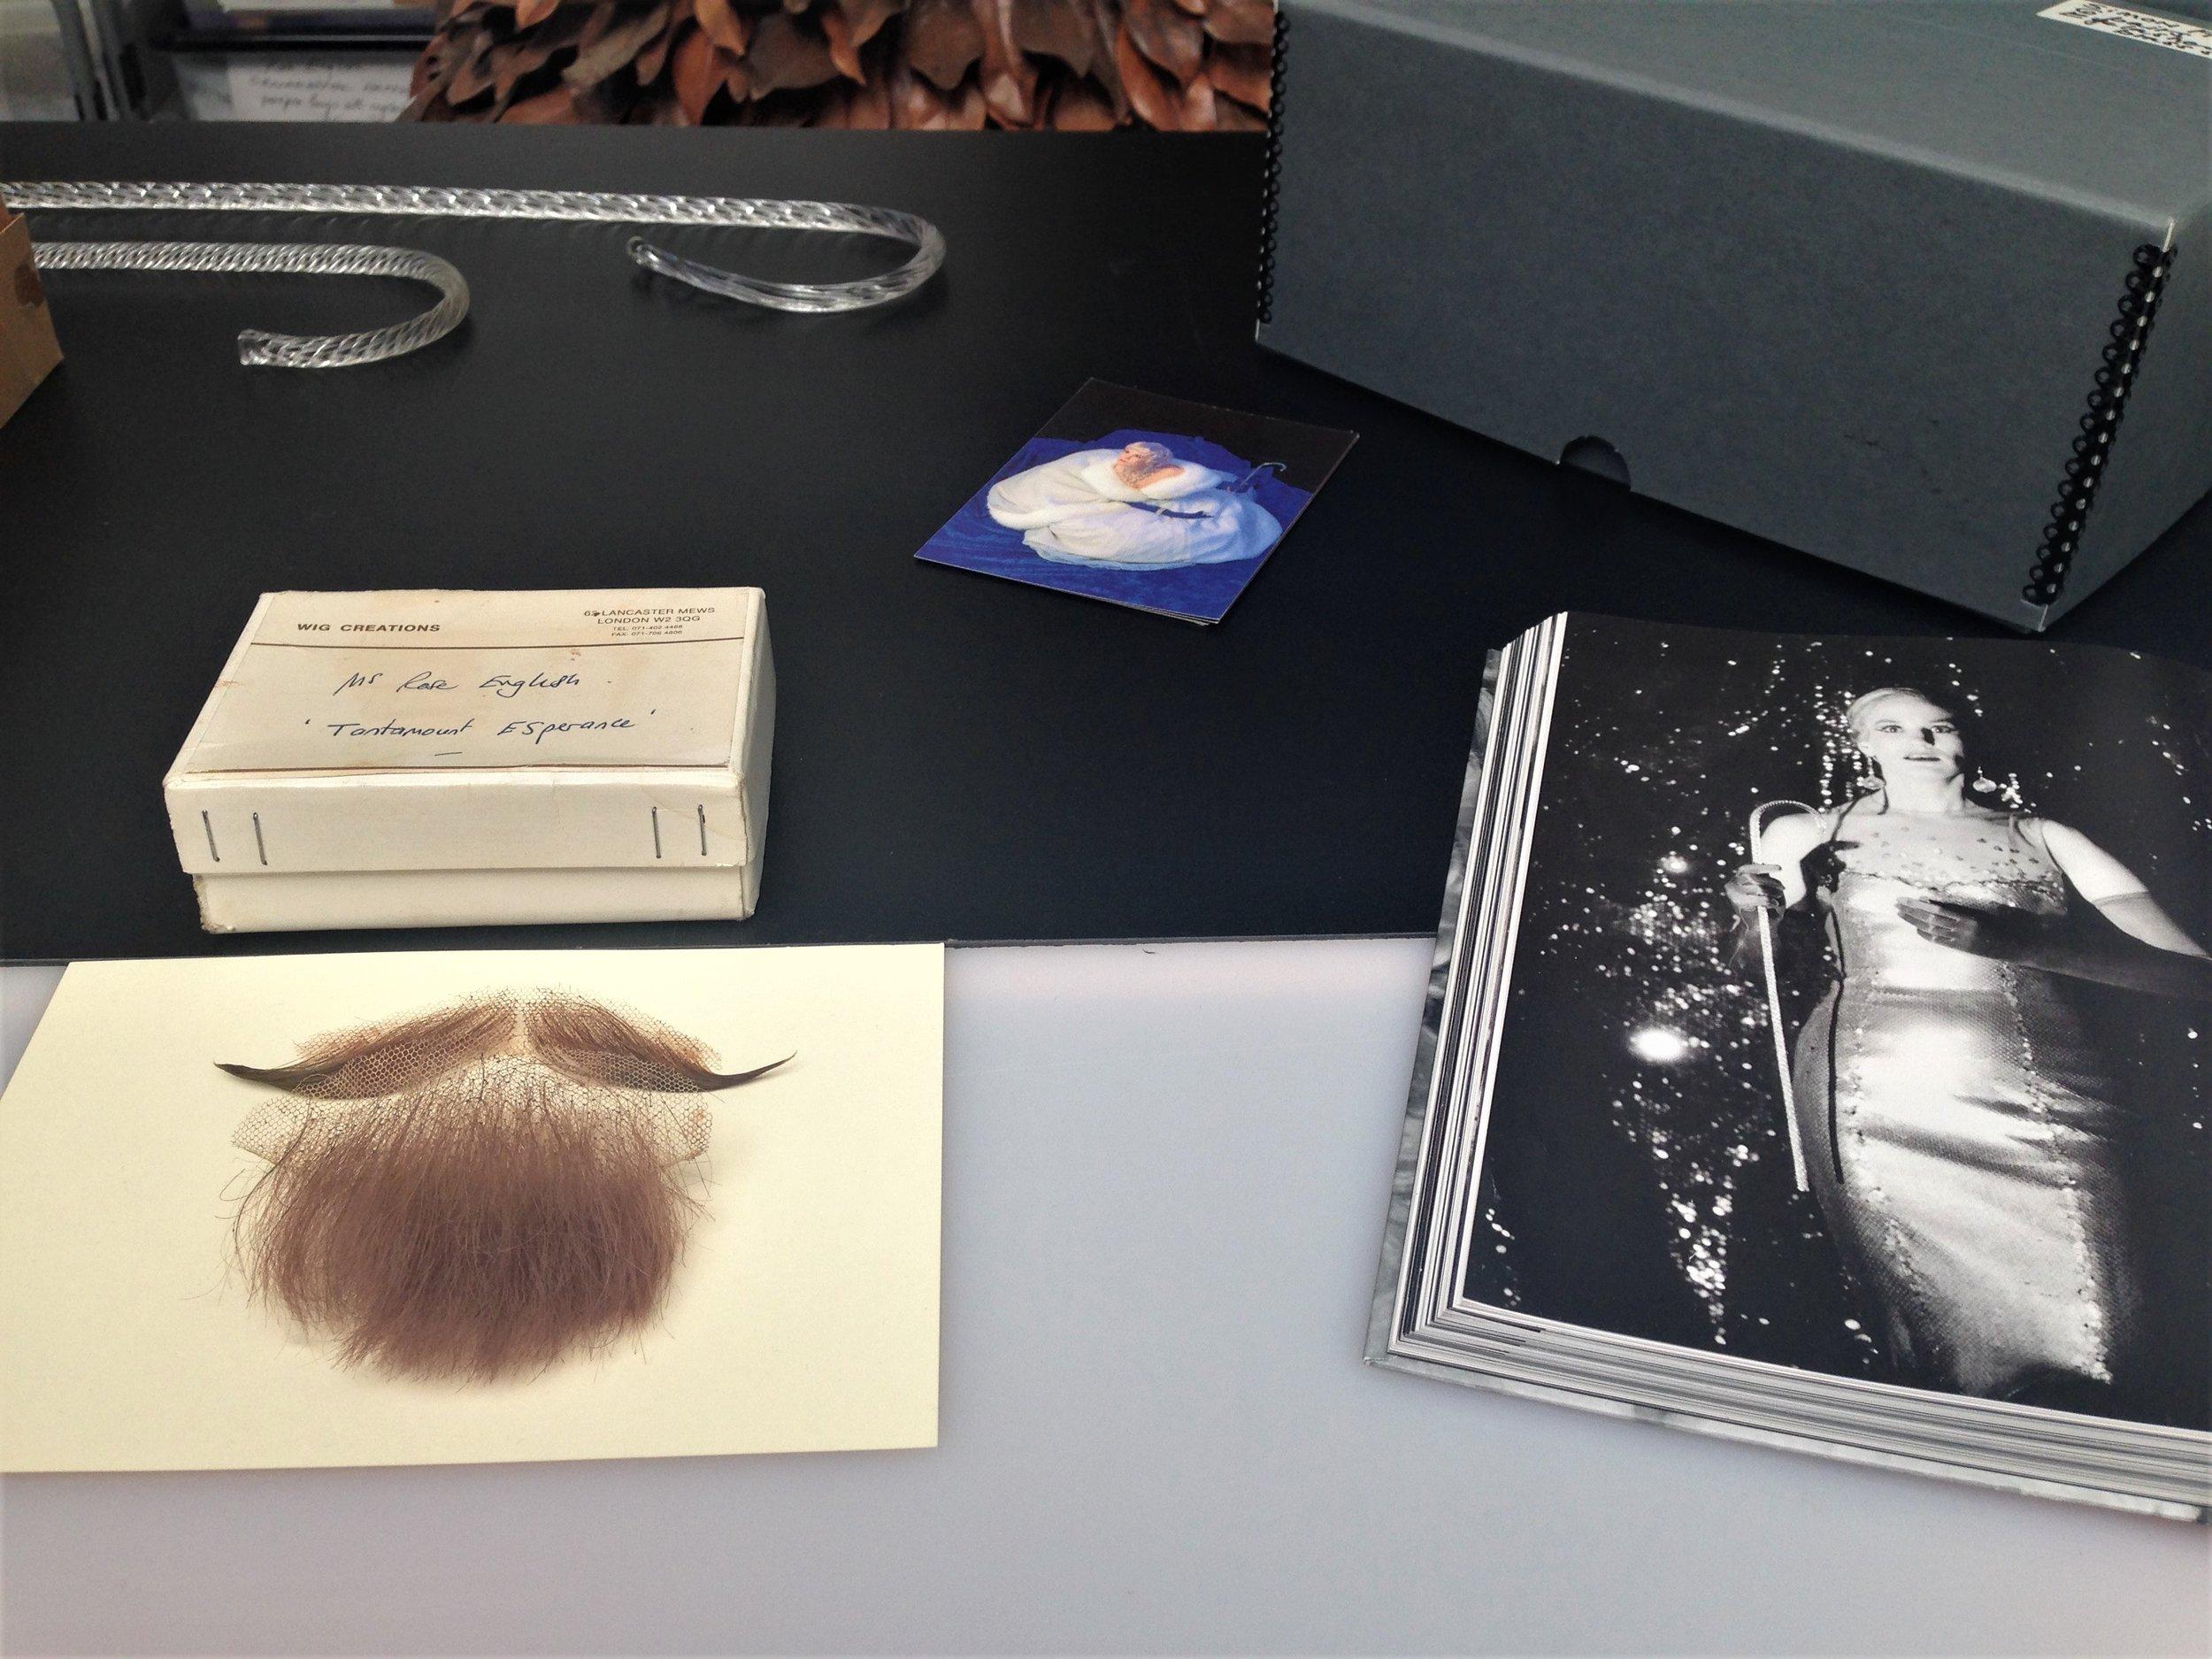 Rose English, Moustache and beard worn in 'Tantamount Esperance', 1994